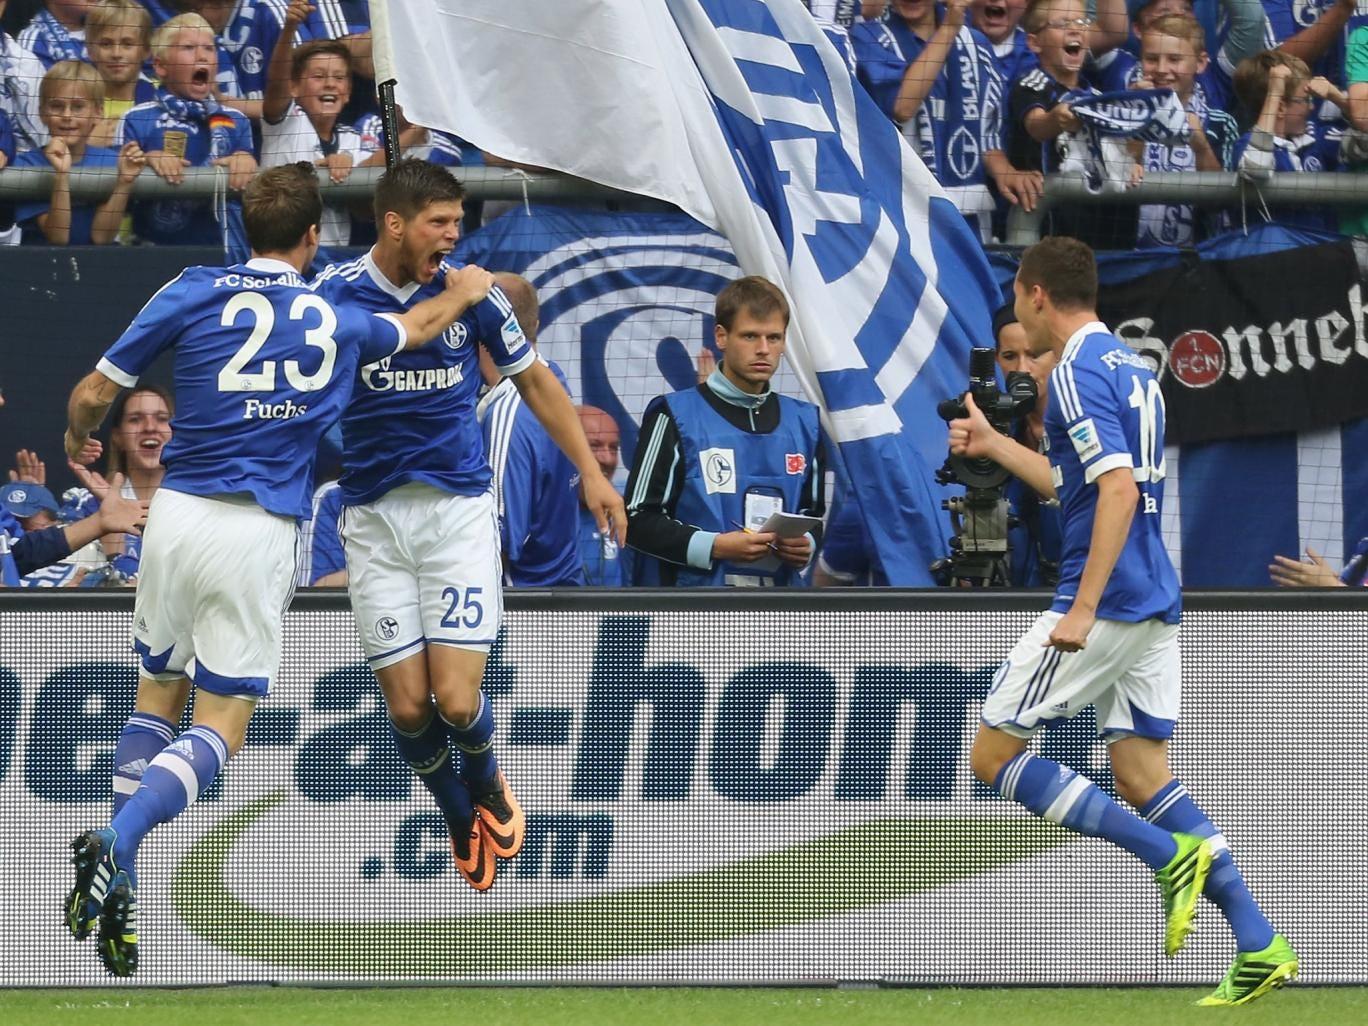 Schalke and Hamburg shared six goals in a rollercoaster 3-3 draw at the Arena AufSchalke